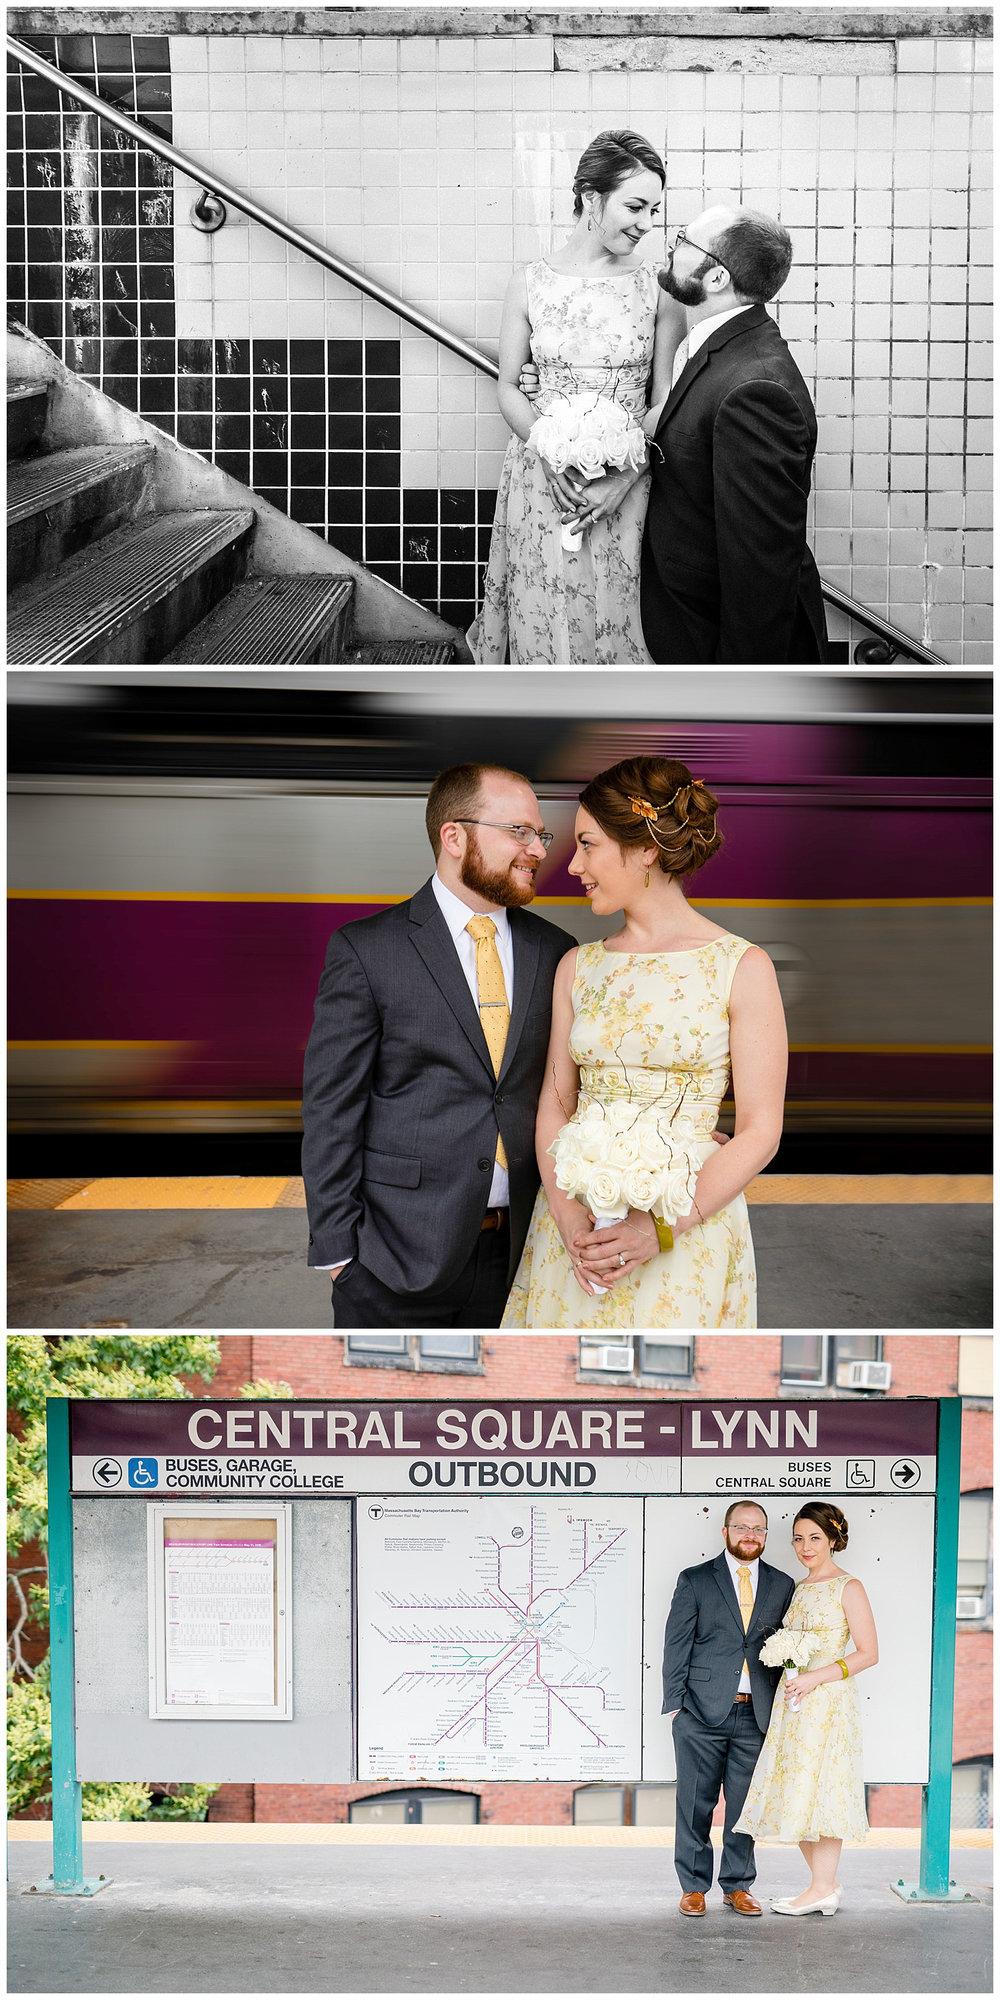 Lynn-Musuem-Wedding-Boston-Photographer-26-North-Studios-011.jpg